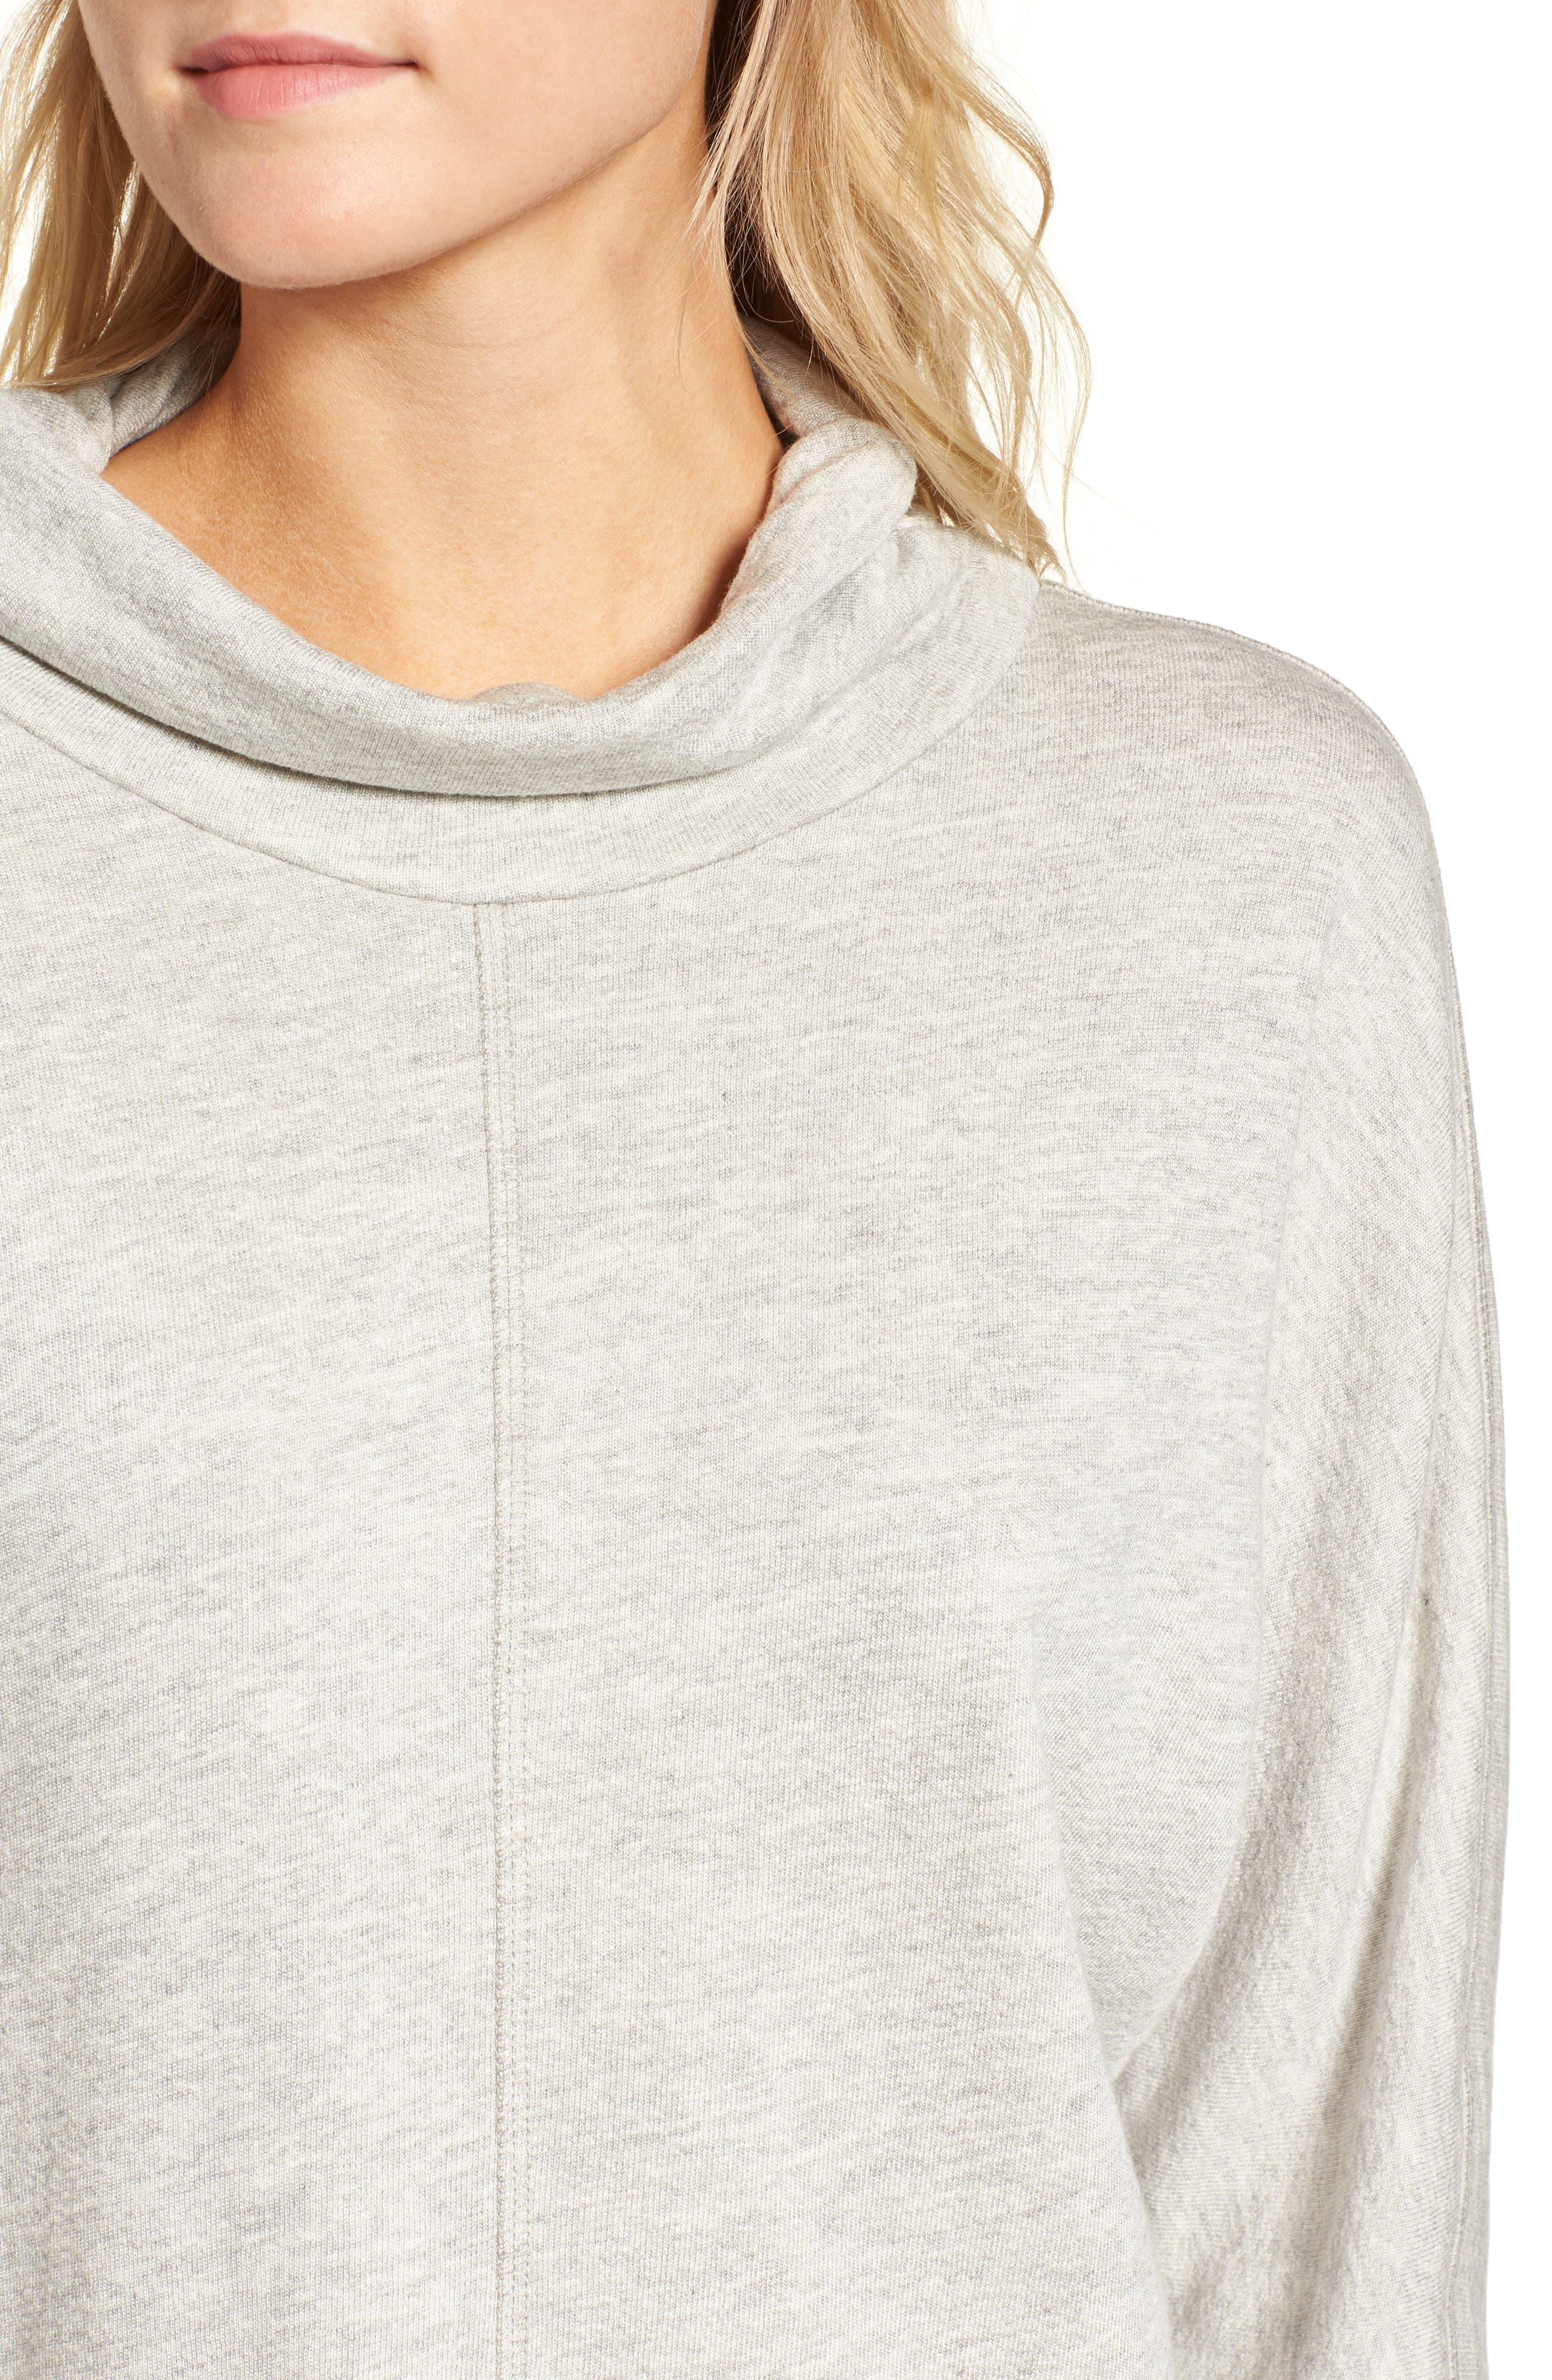 Helix Turtleneck Sweatshirt,                             Alternate thumbnail 4, color,                             030